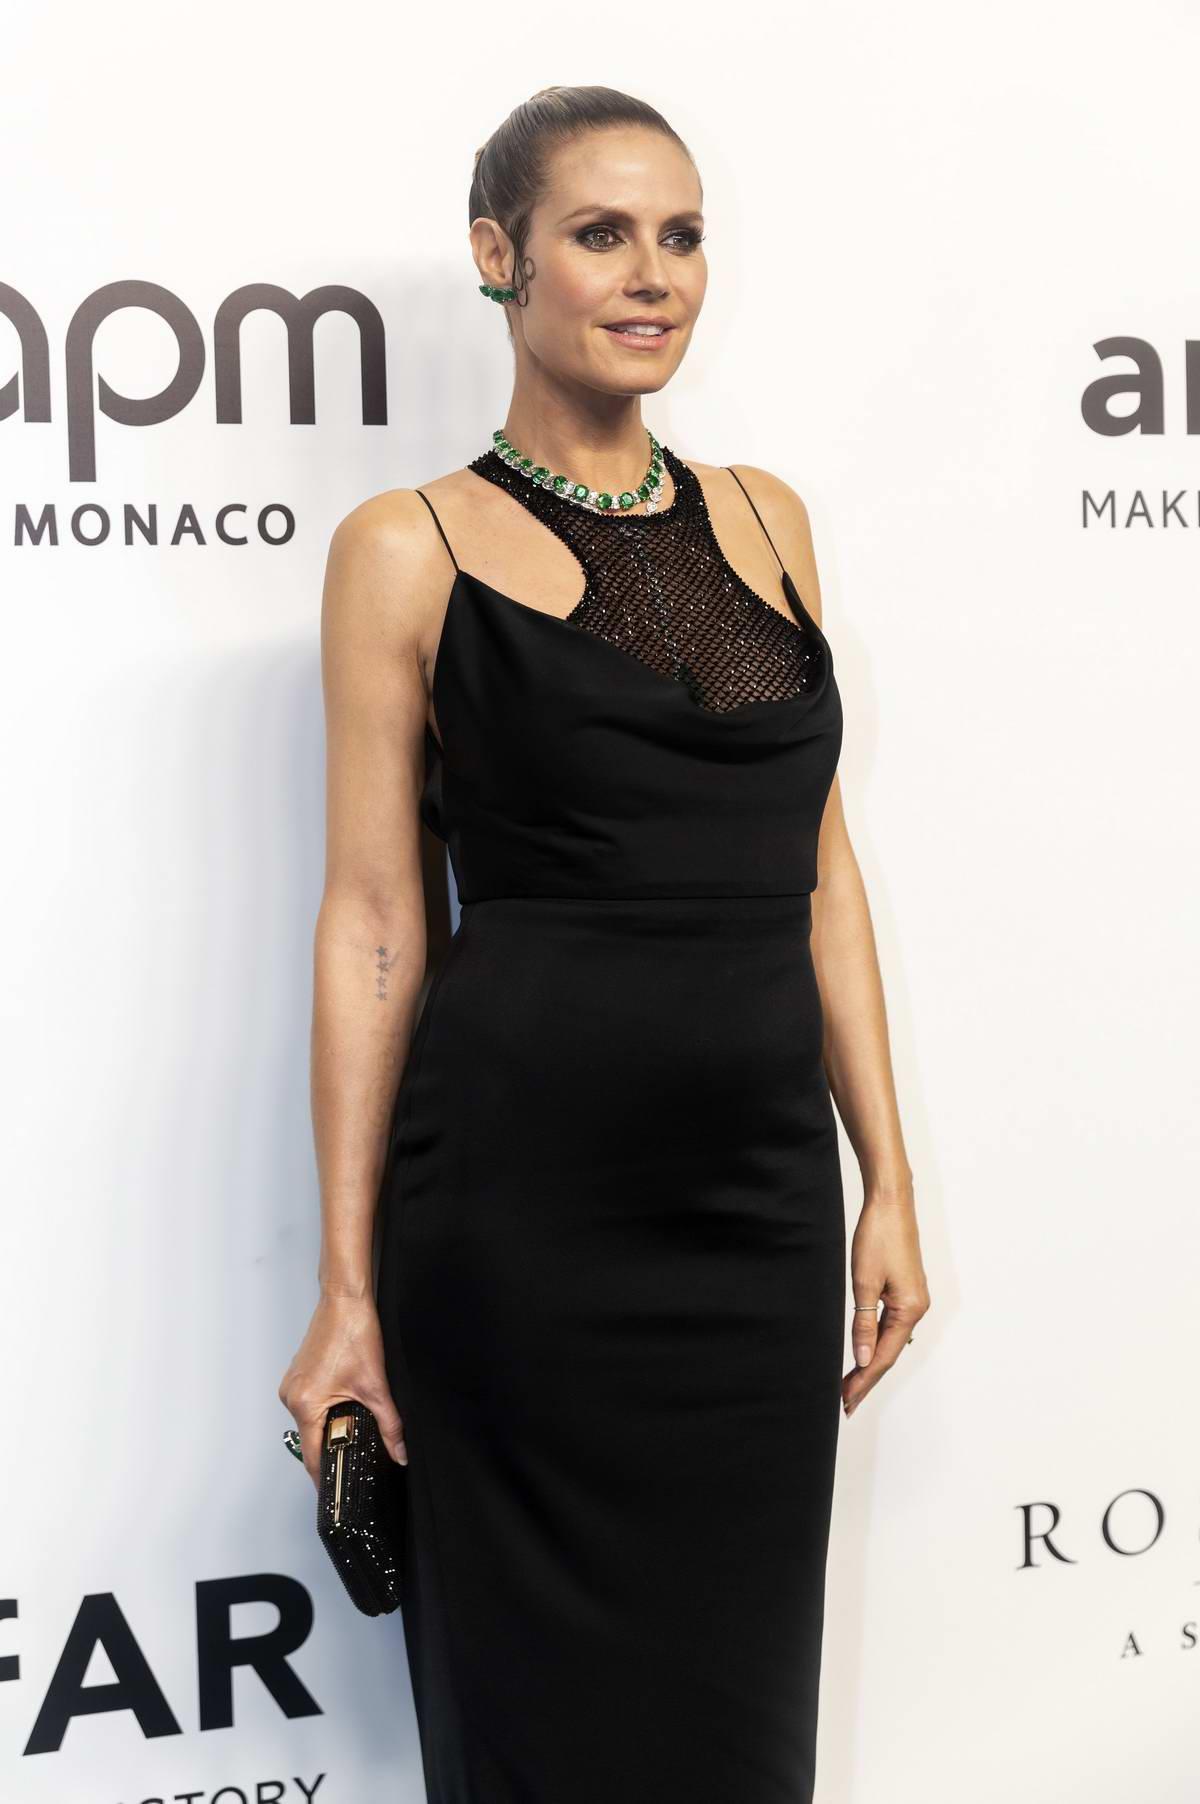 Heidi Klum and Tom Kaulitz attend amfAR Gala in Hong Kong, China